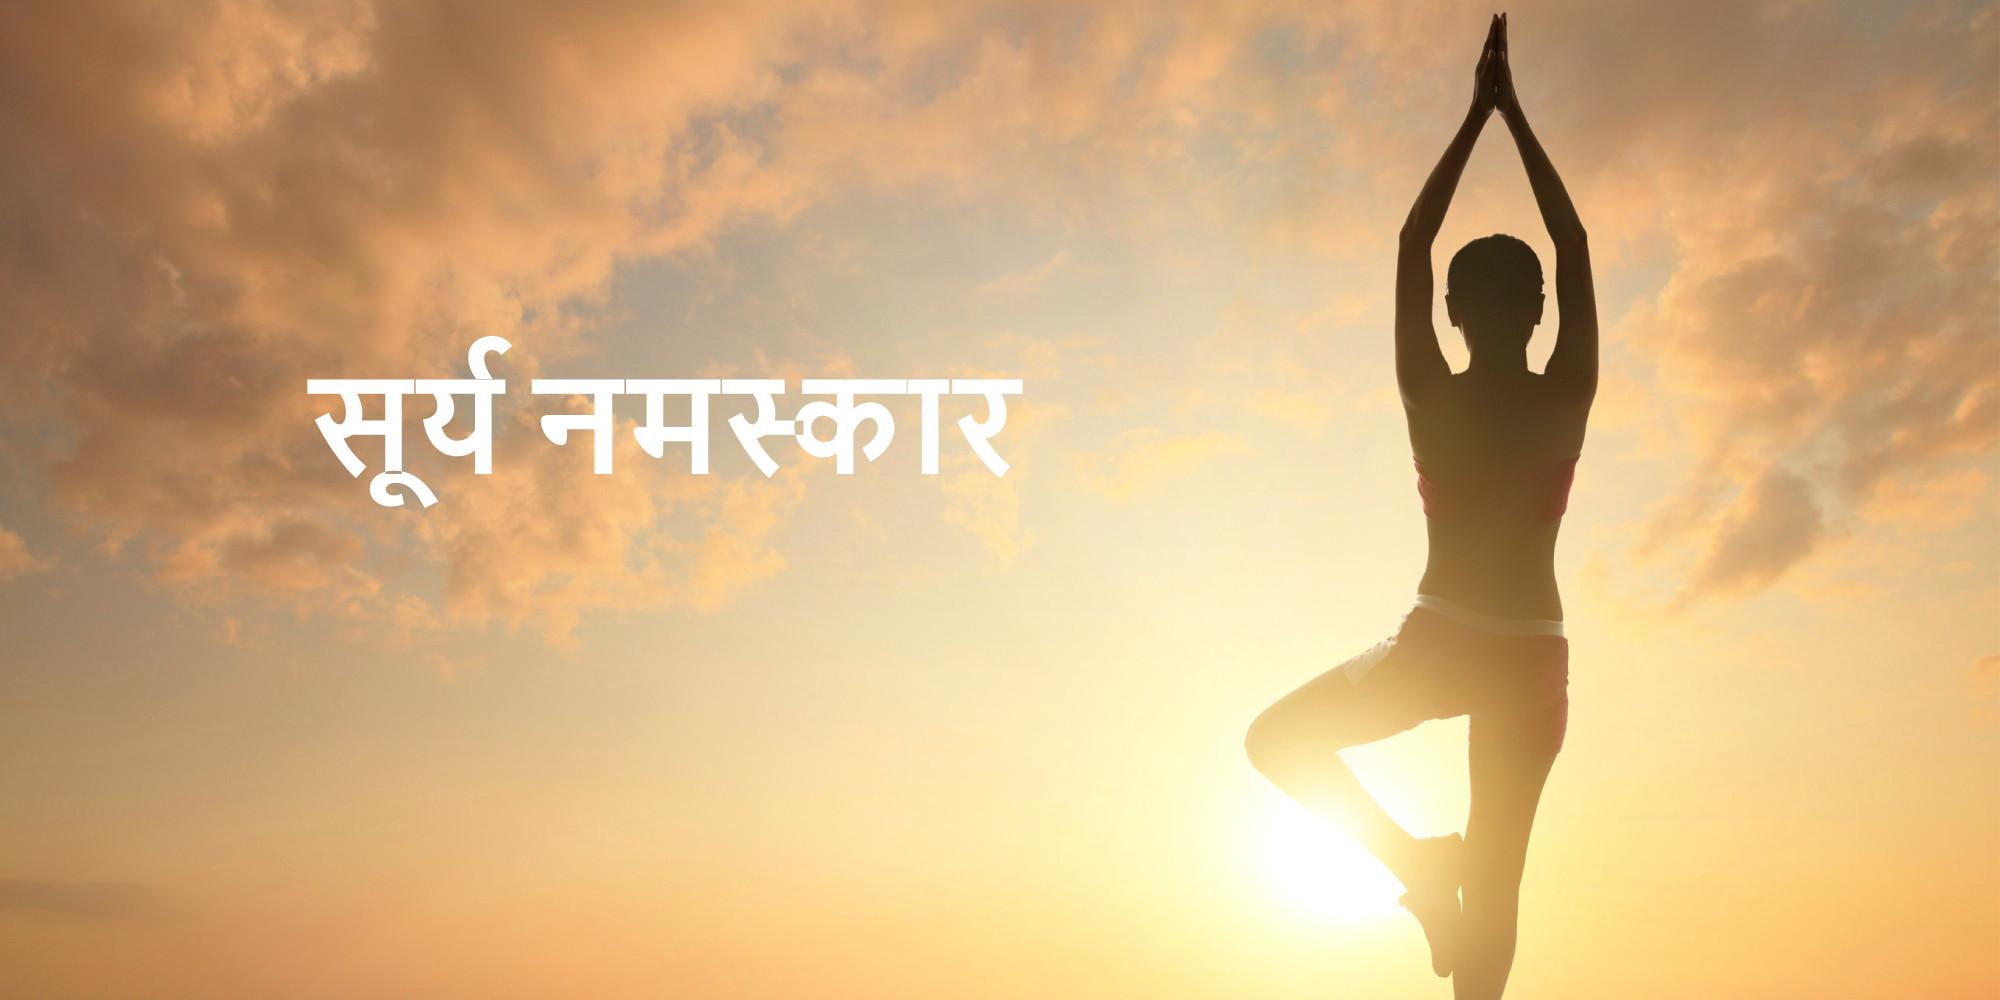 सूर्य नमस्कार आसन - Surya Namaskar Aasan